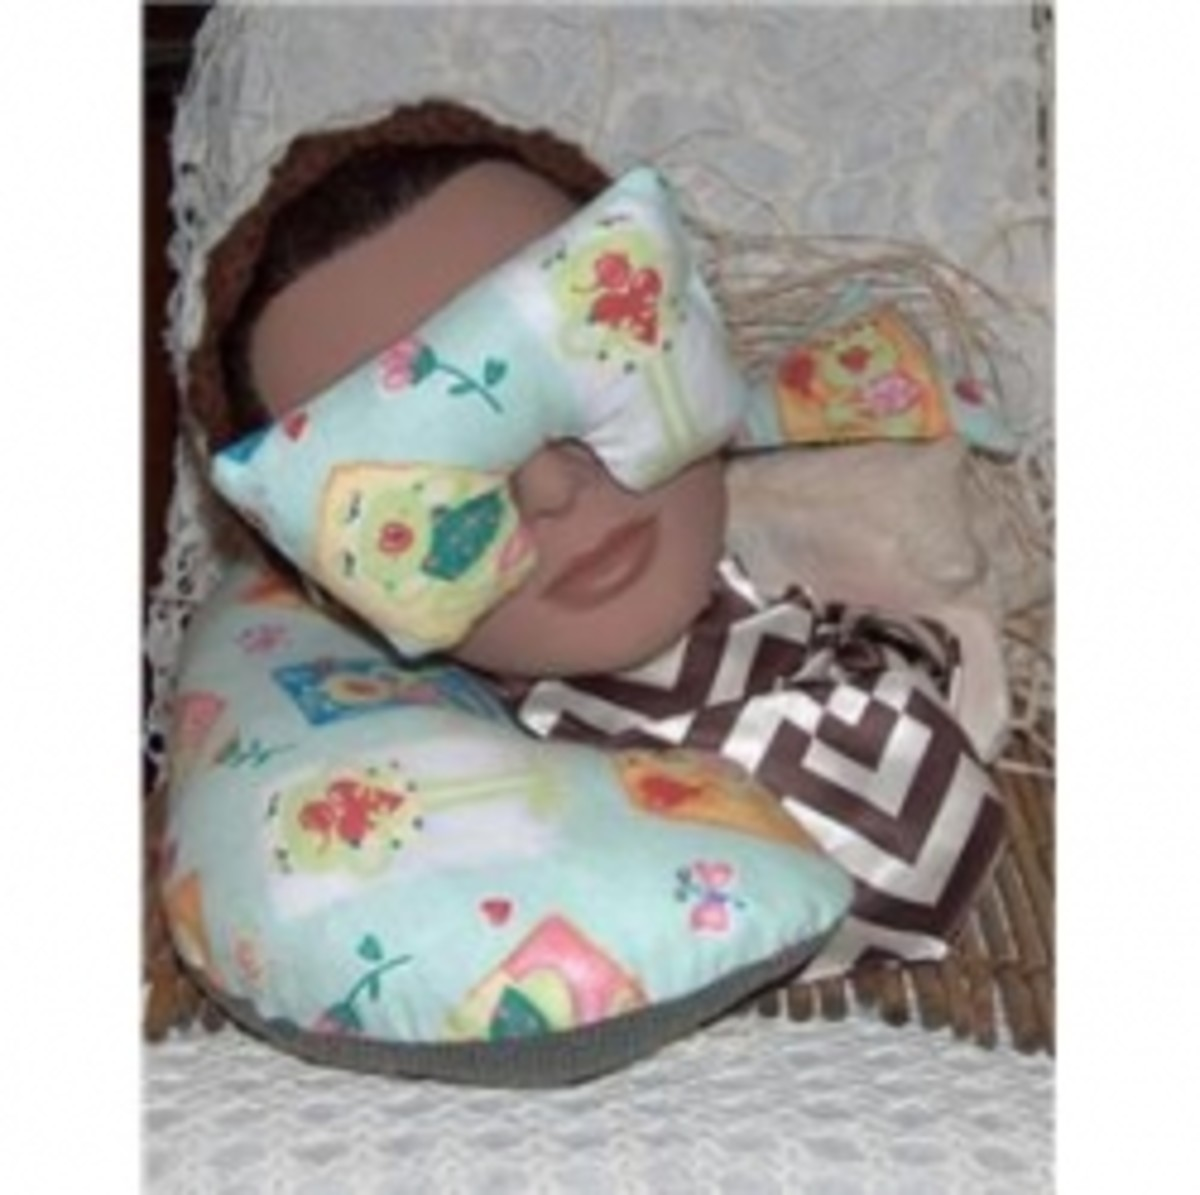 Hand-sewn eye mask; washable eye mask liner; neck pillow; and sachet luxury relaxation or travel set